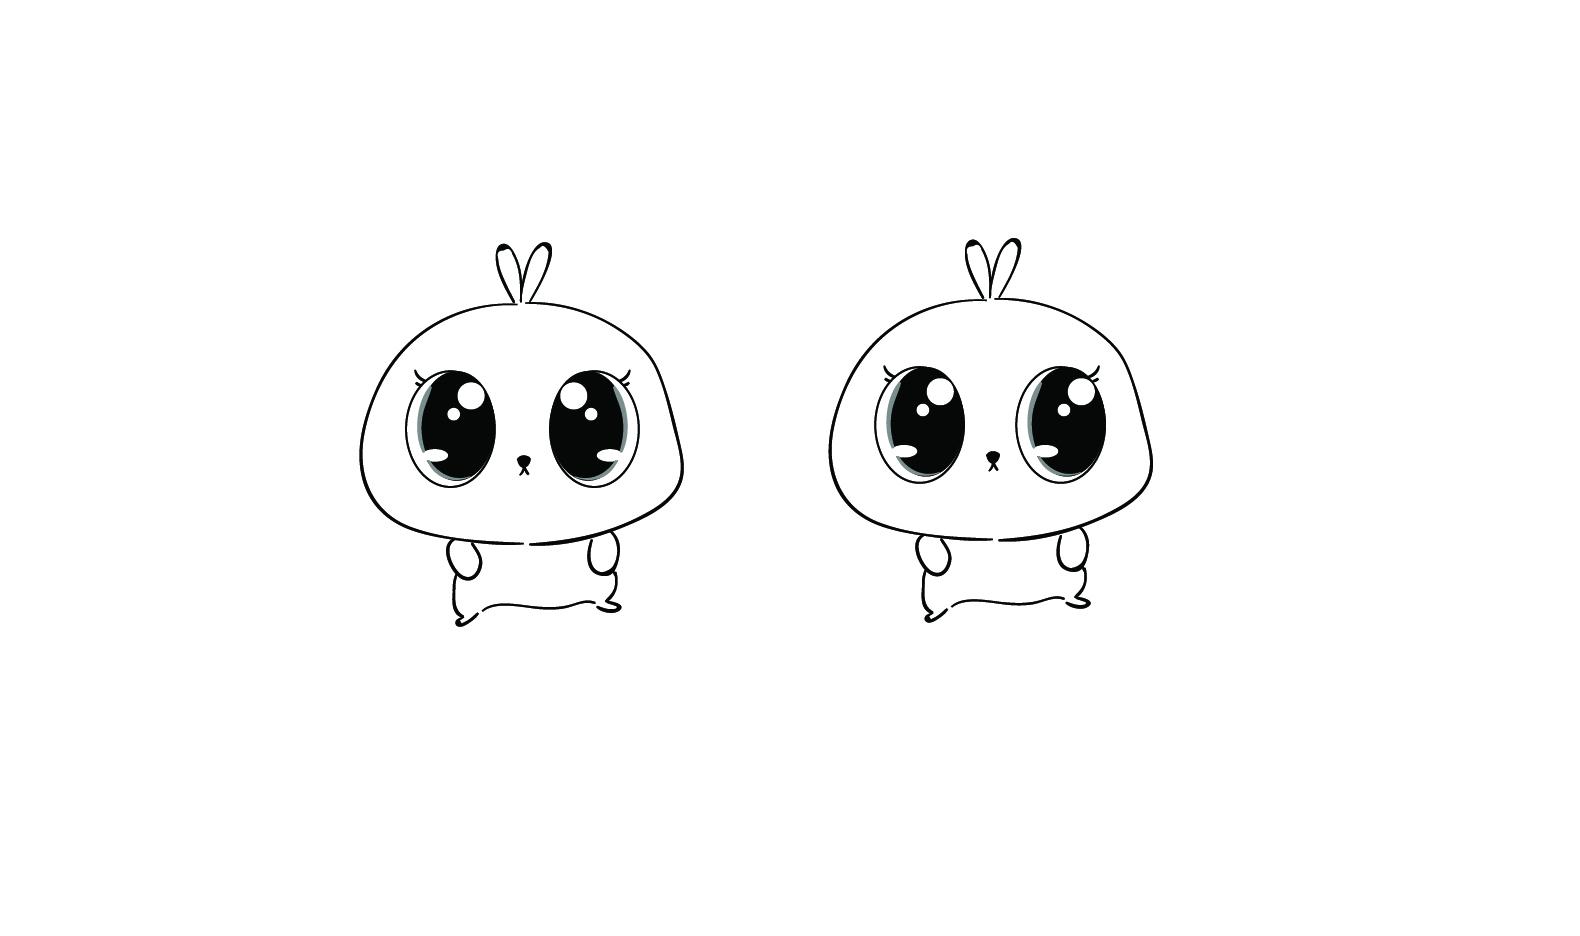 2019-07-08 Bunny Concept 4.jpg